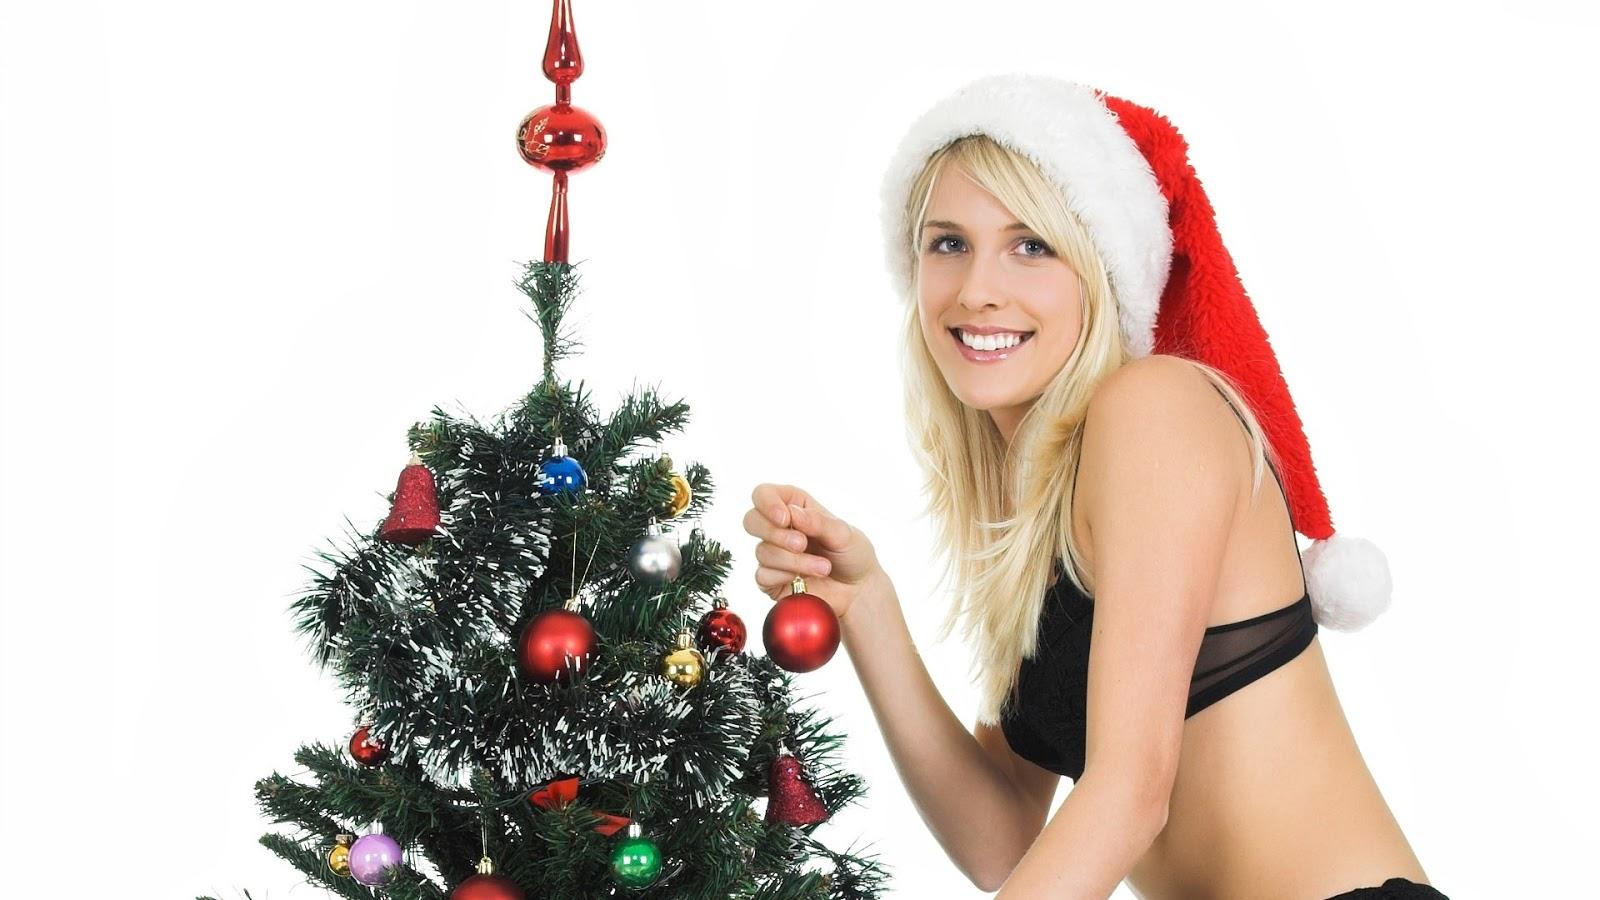 Full HD Girls Happy Christmas Wallpapers 1920x1080